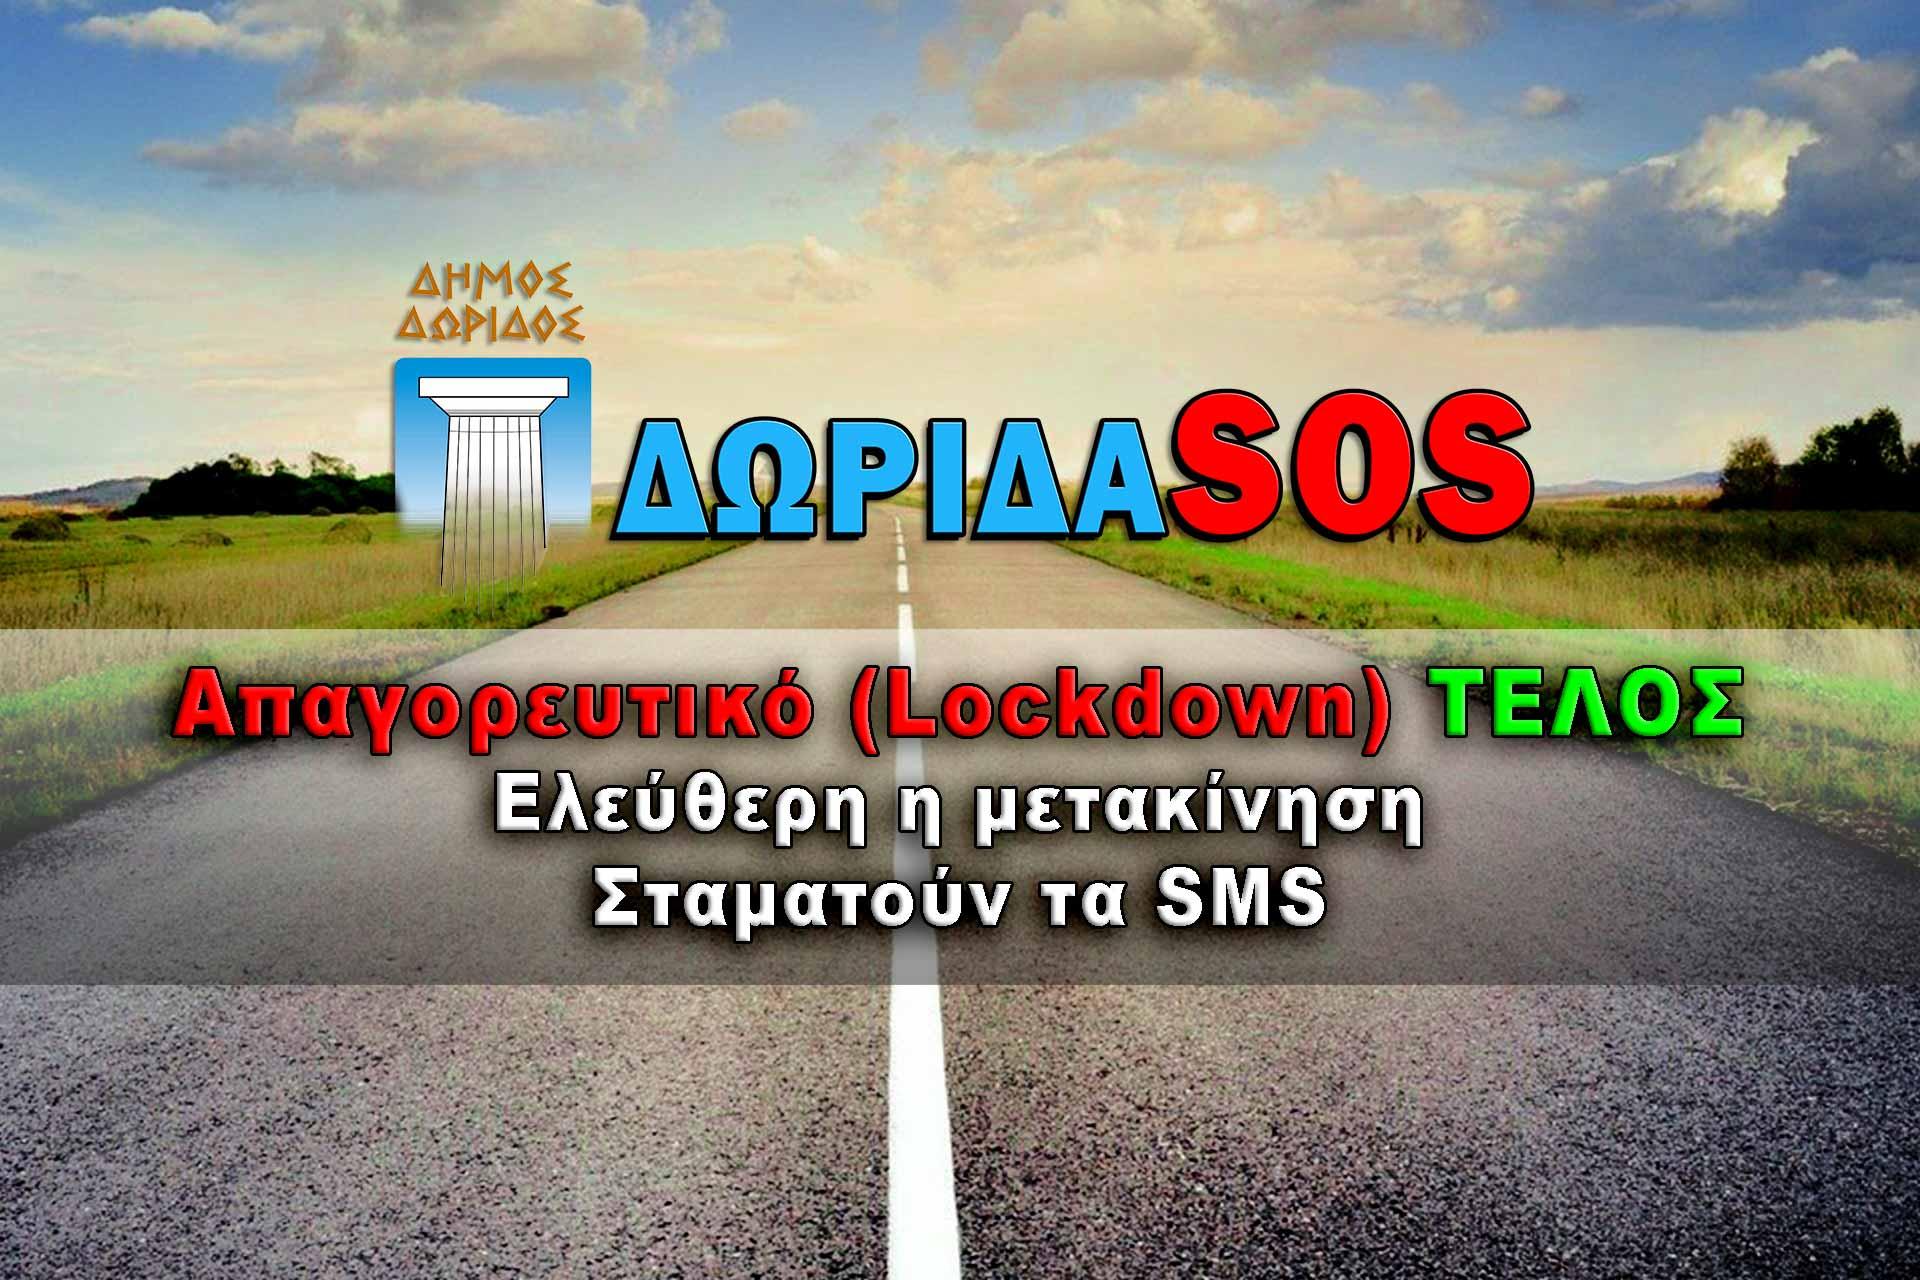 Dorida SOS-Απαγορευτικό (Lockdown) ΤΕΛΟΣ